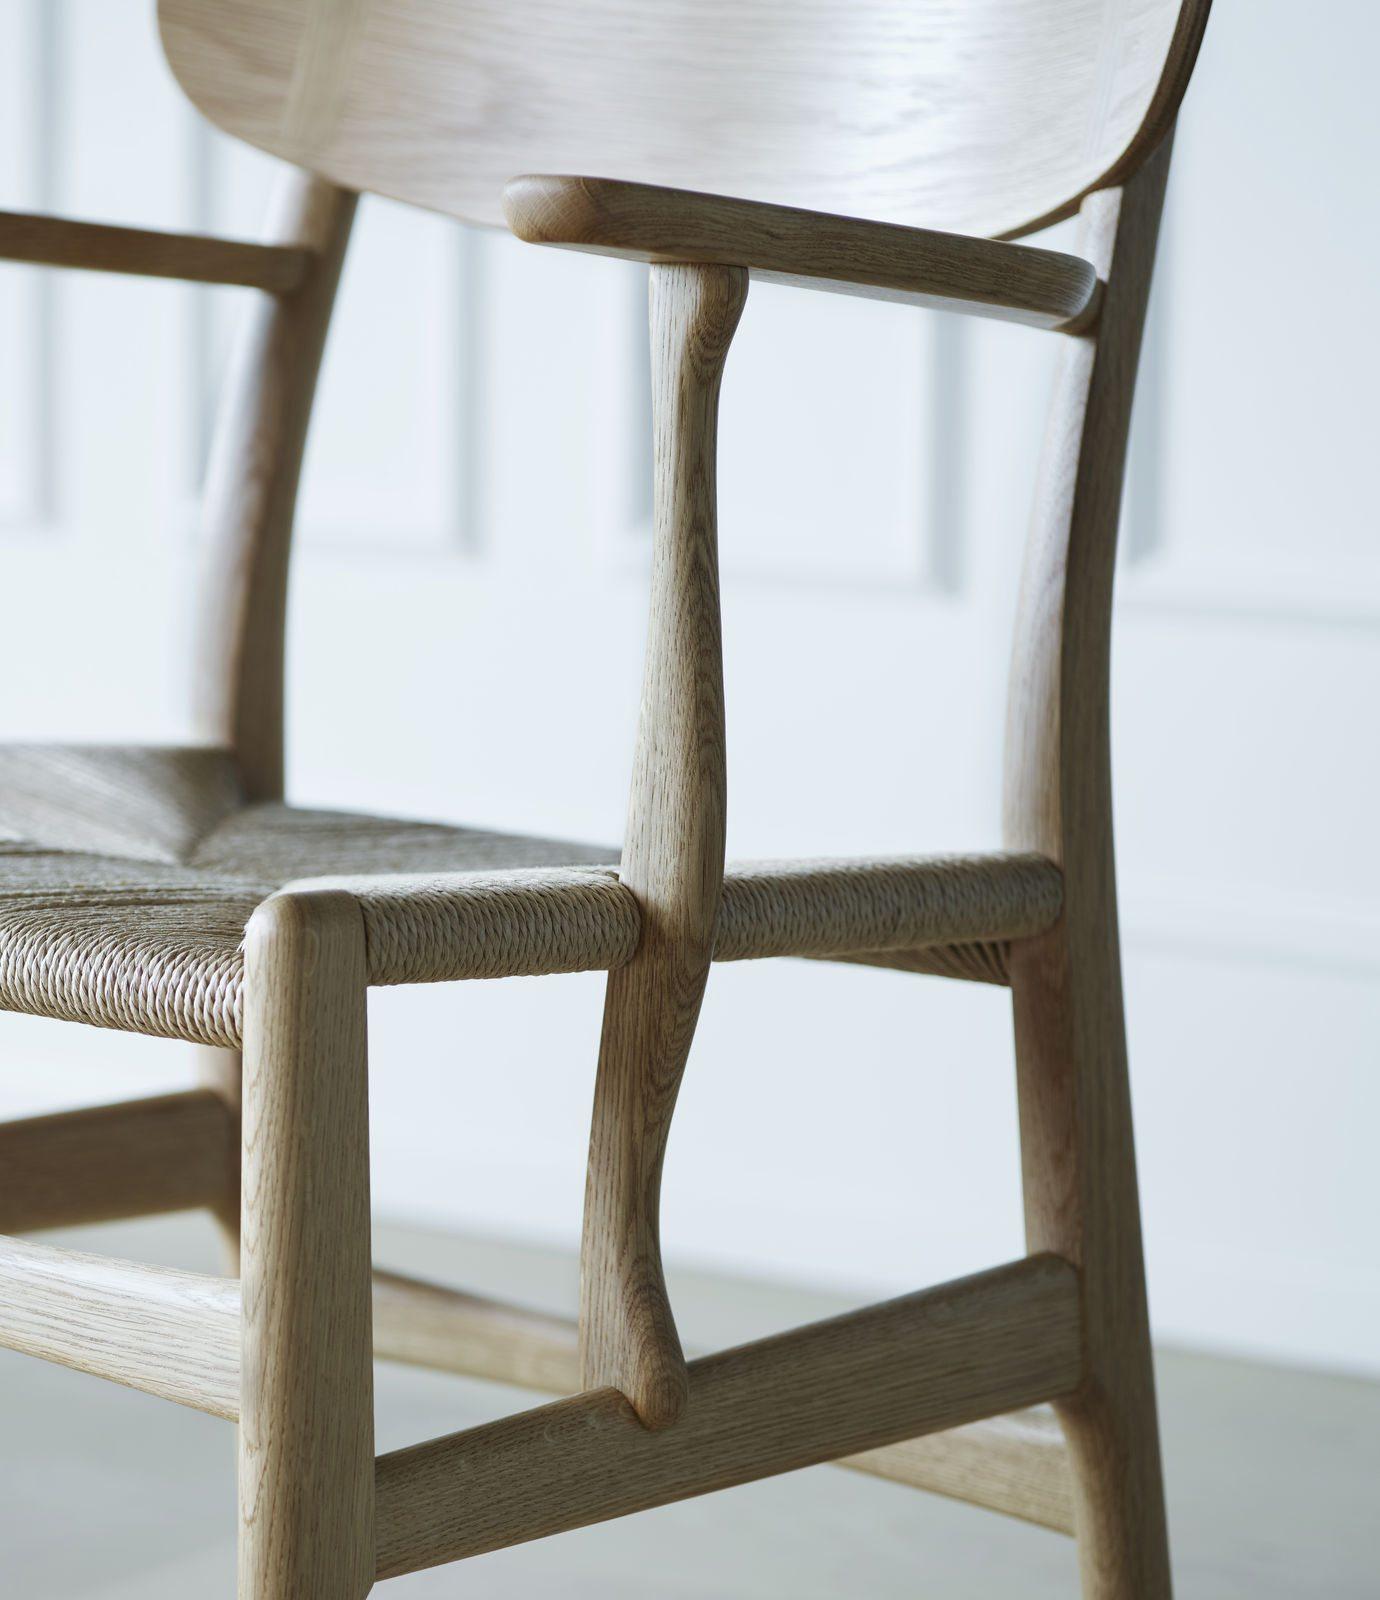 carl hansen ch26 stuhl nordic urban berlin germany. Black Bedroom Furniture Sets. Home Design Ideas